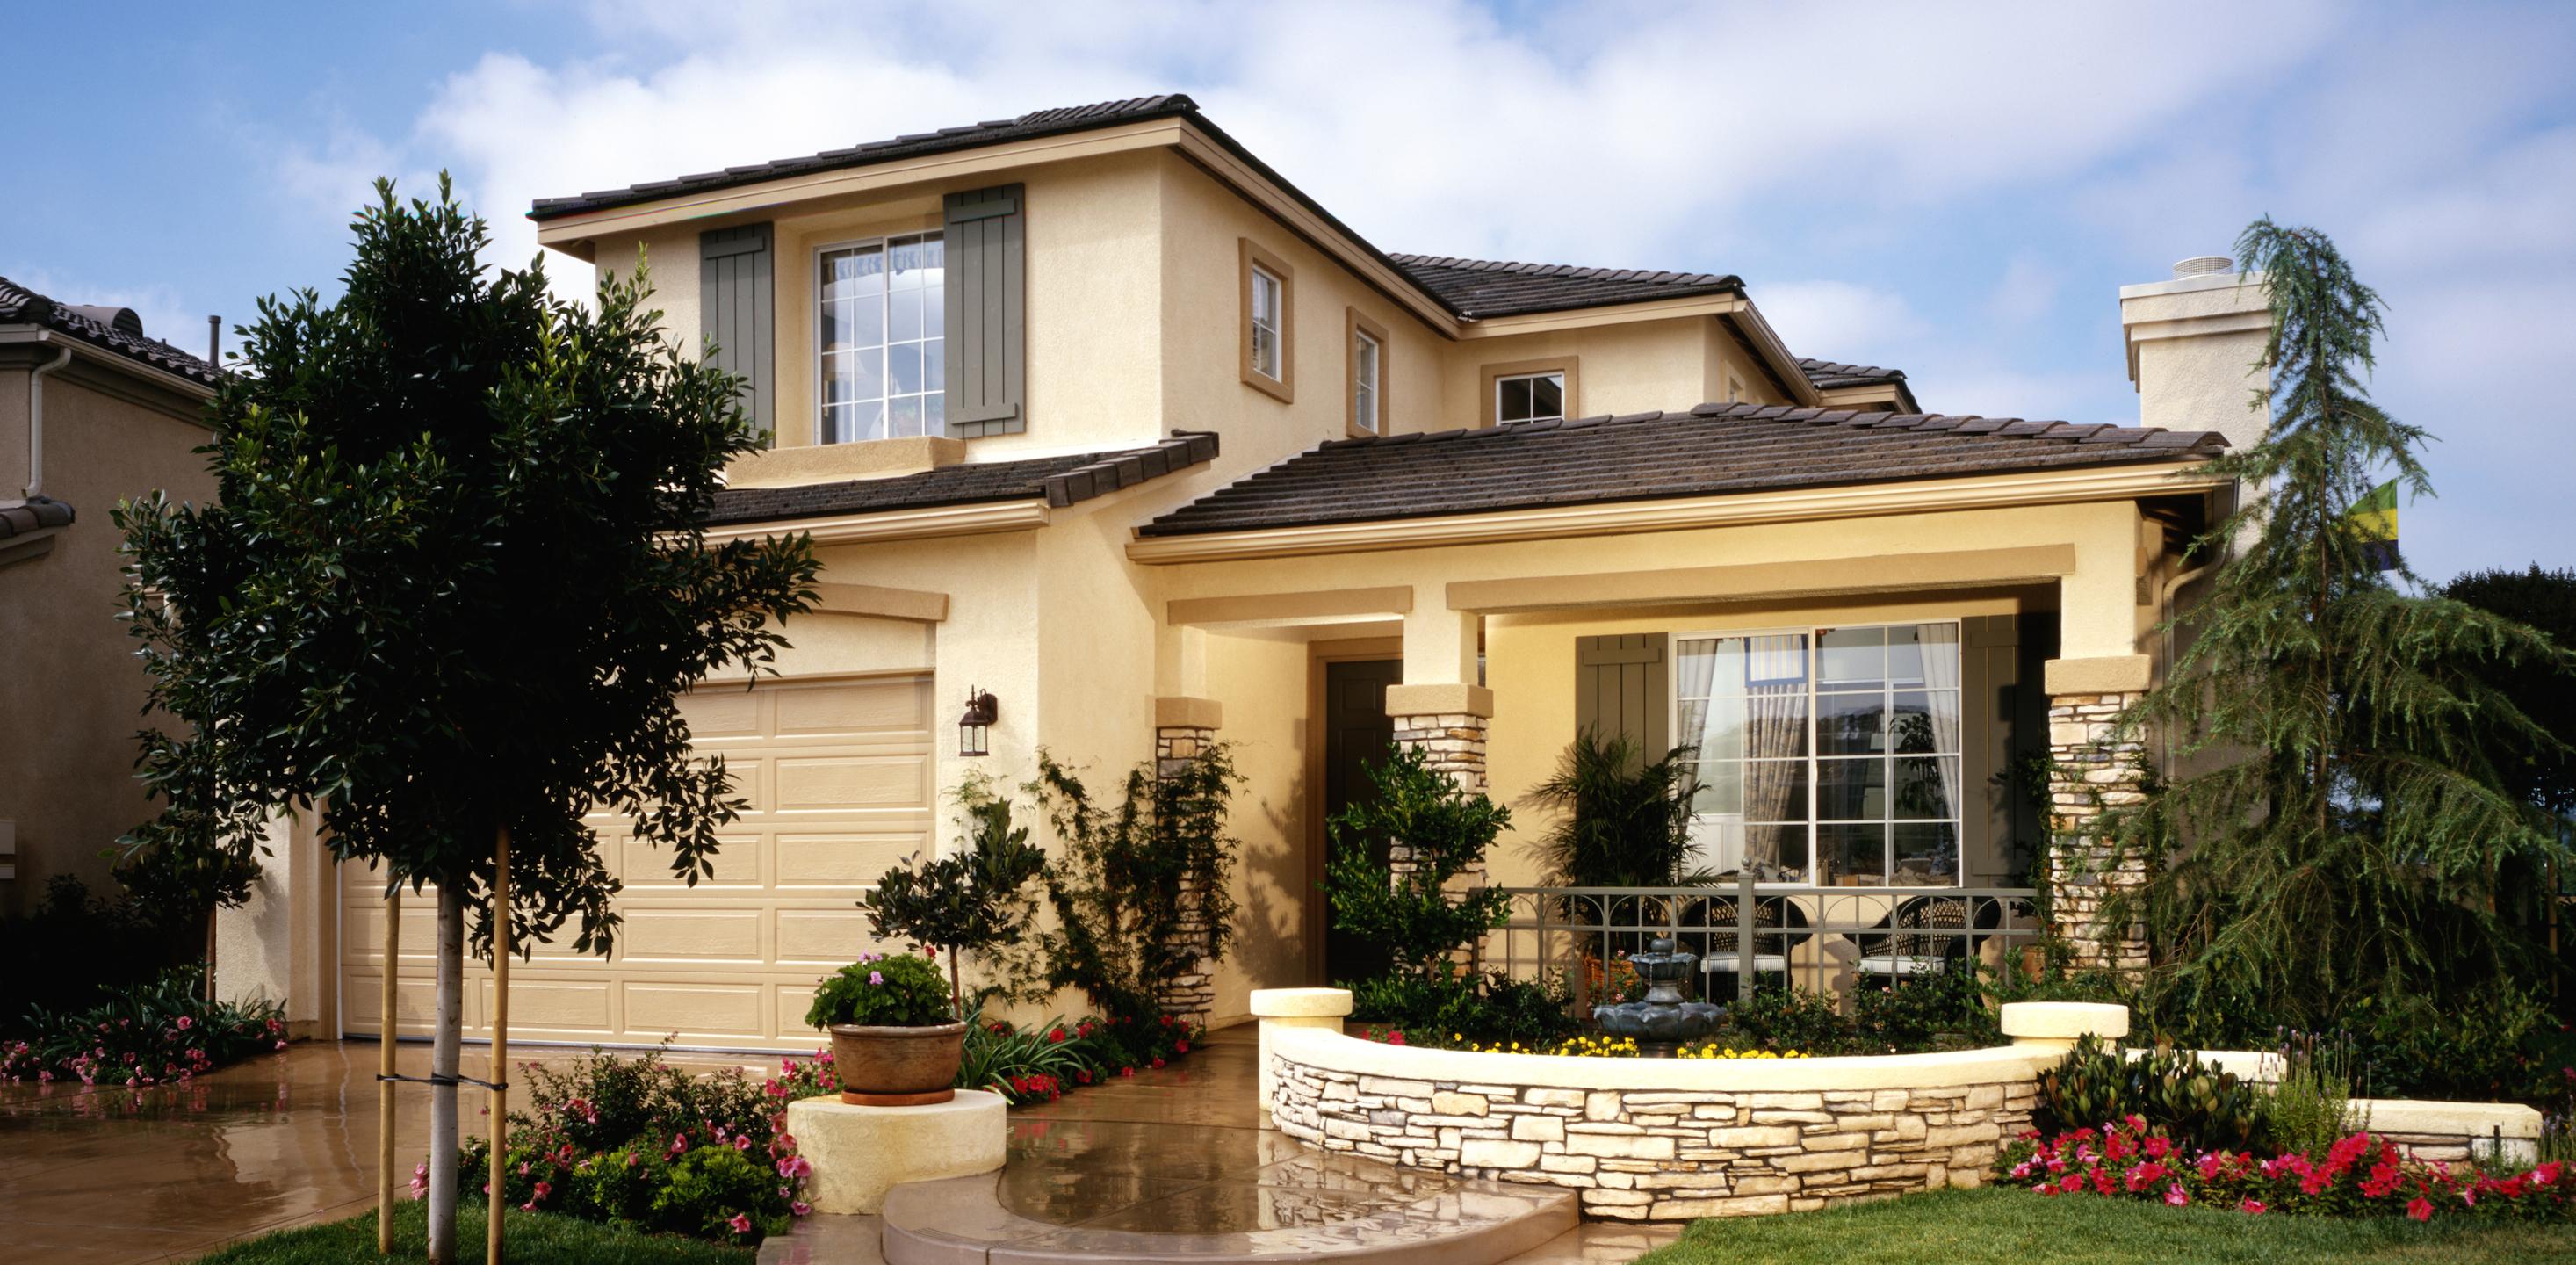 Ocoee Real Estate- Search all Ocoee homes and condos for sale